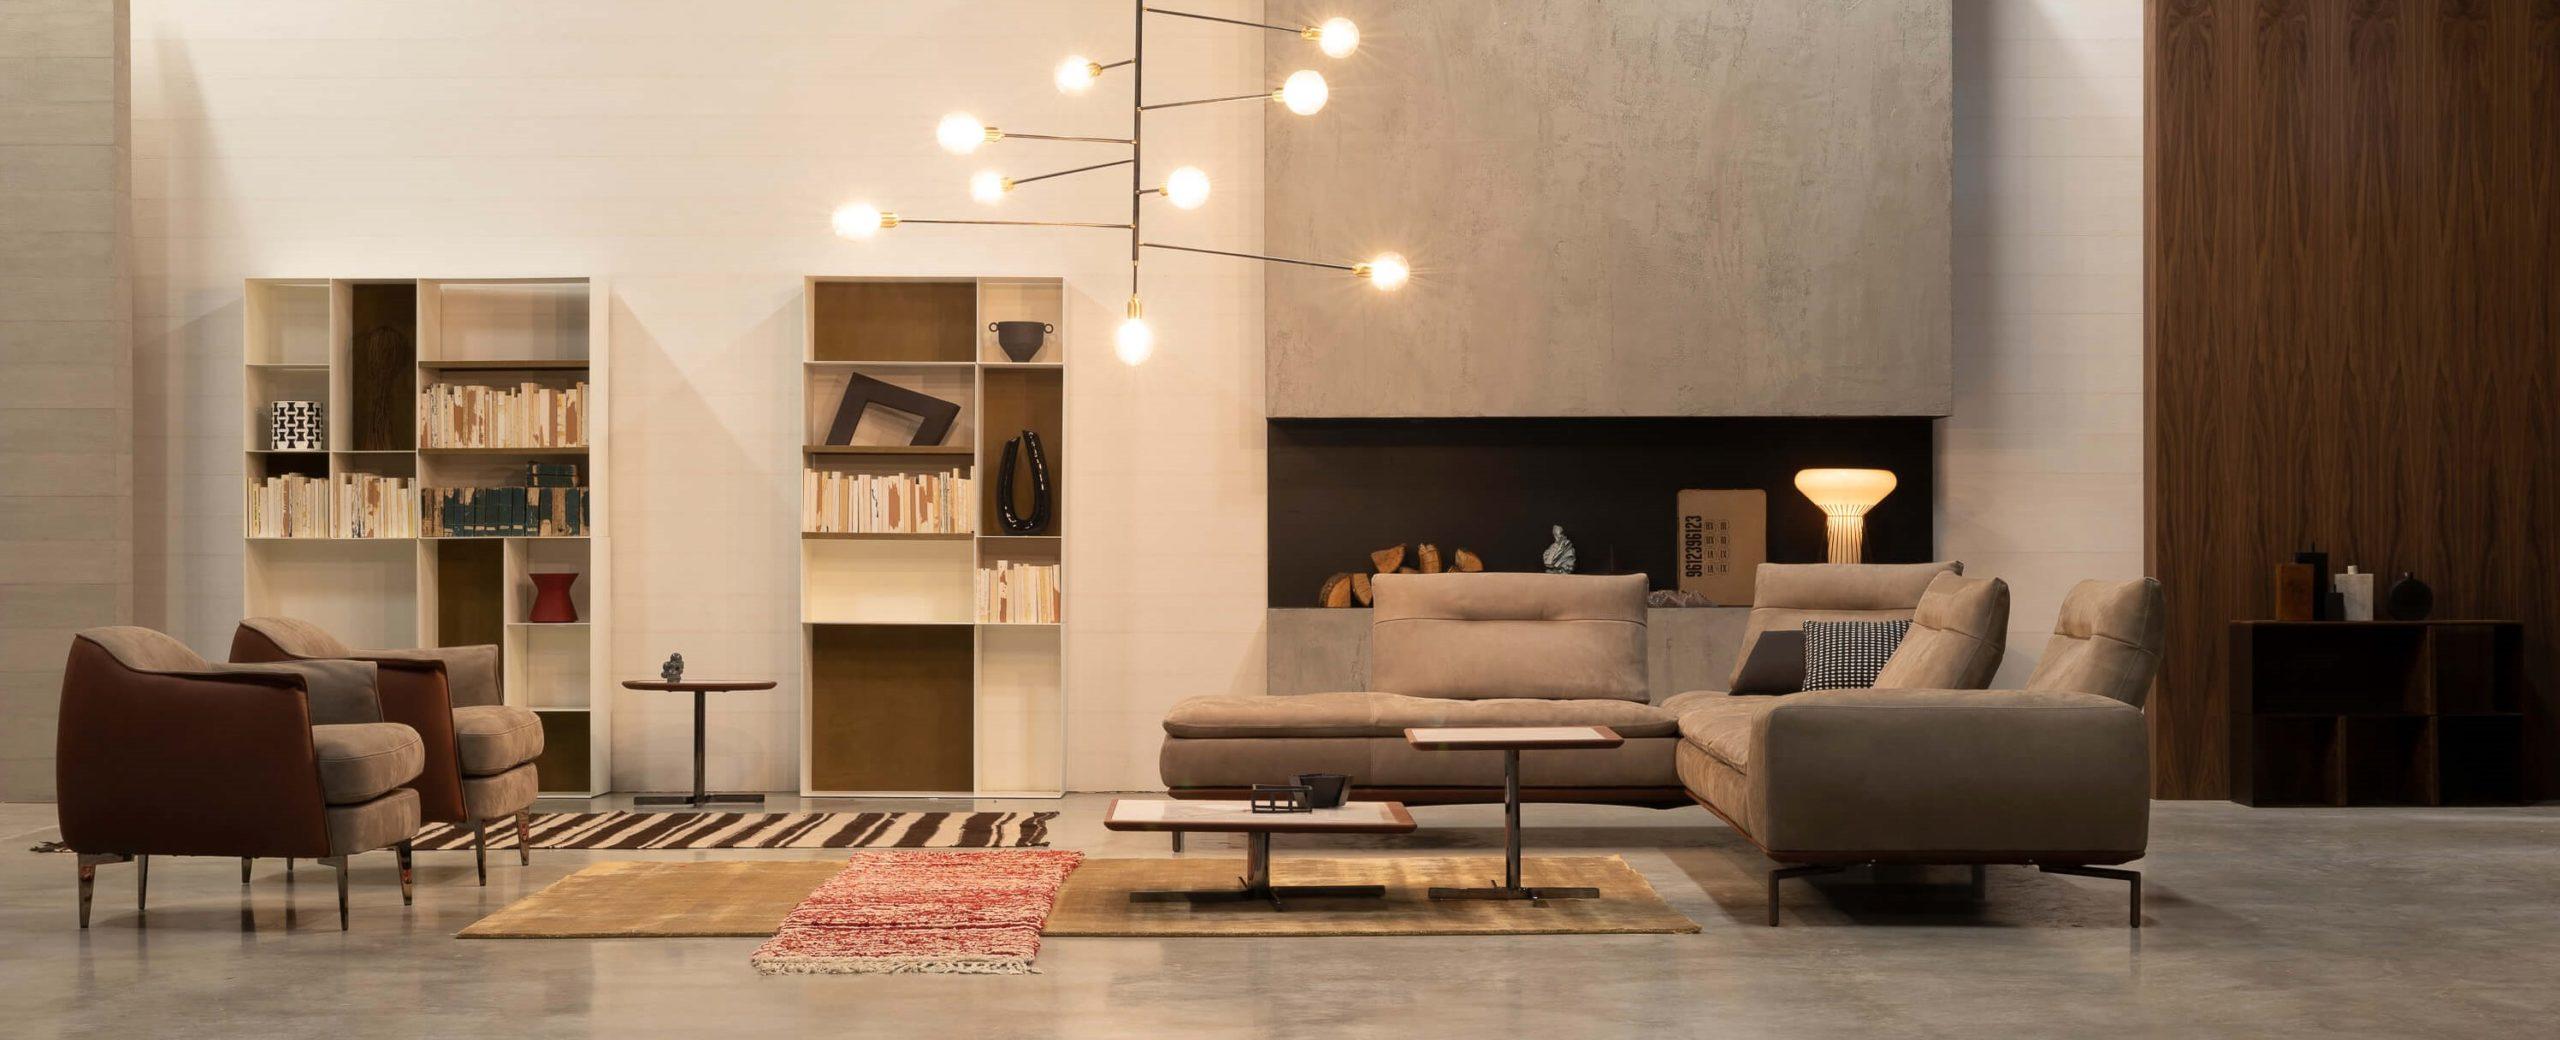 Kako osvetliti mali prostor?